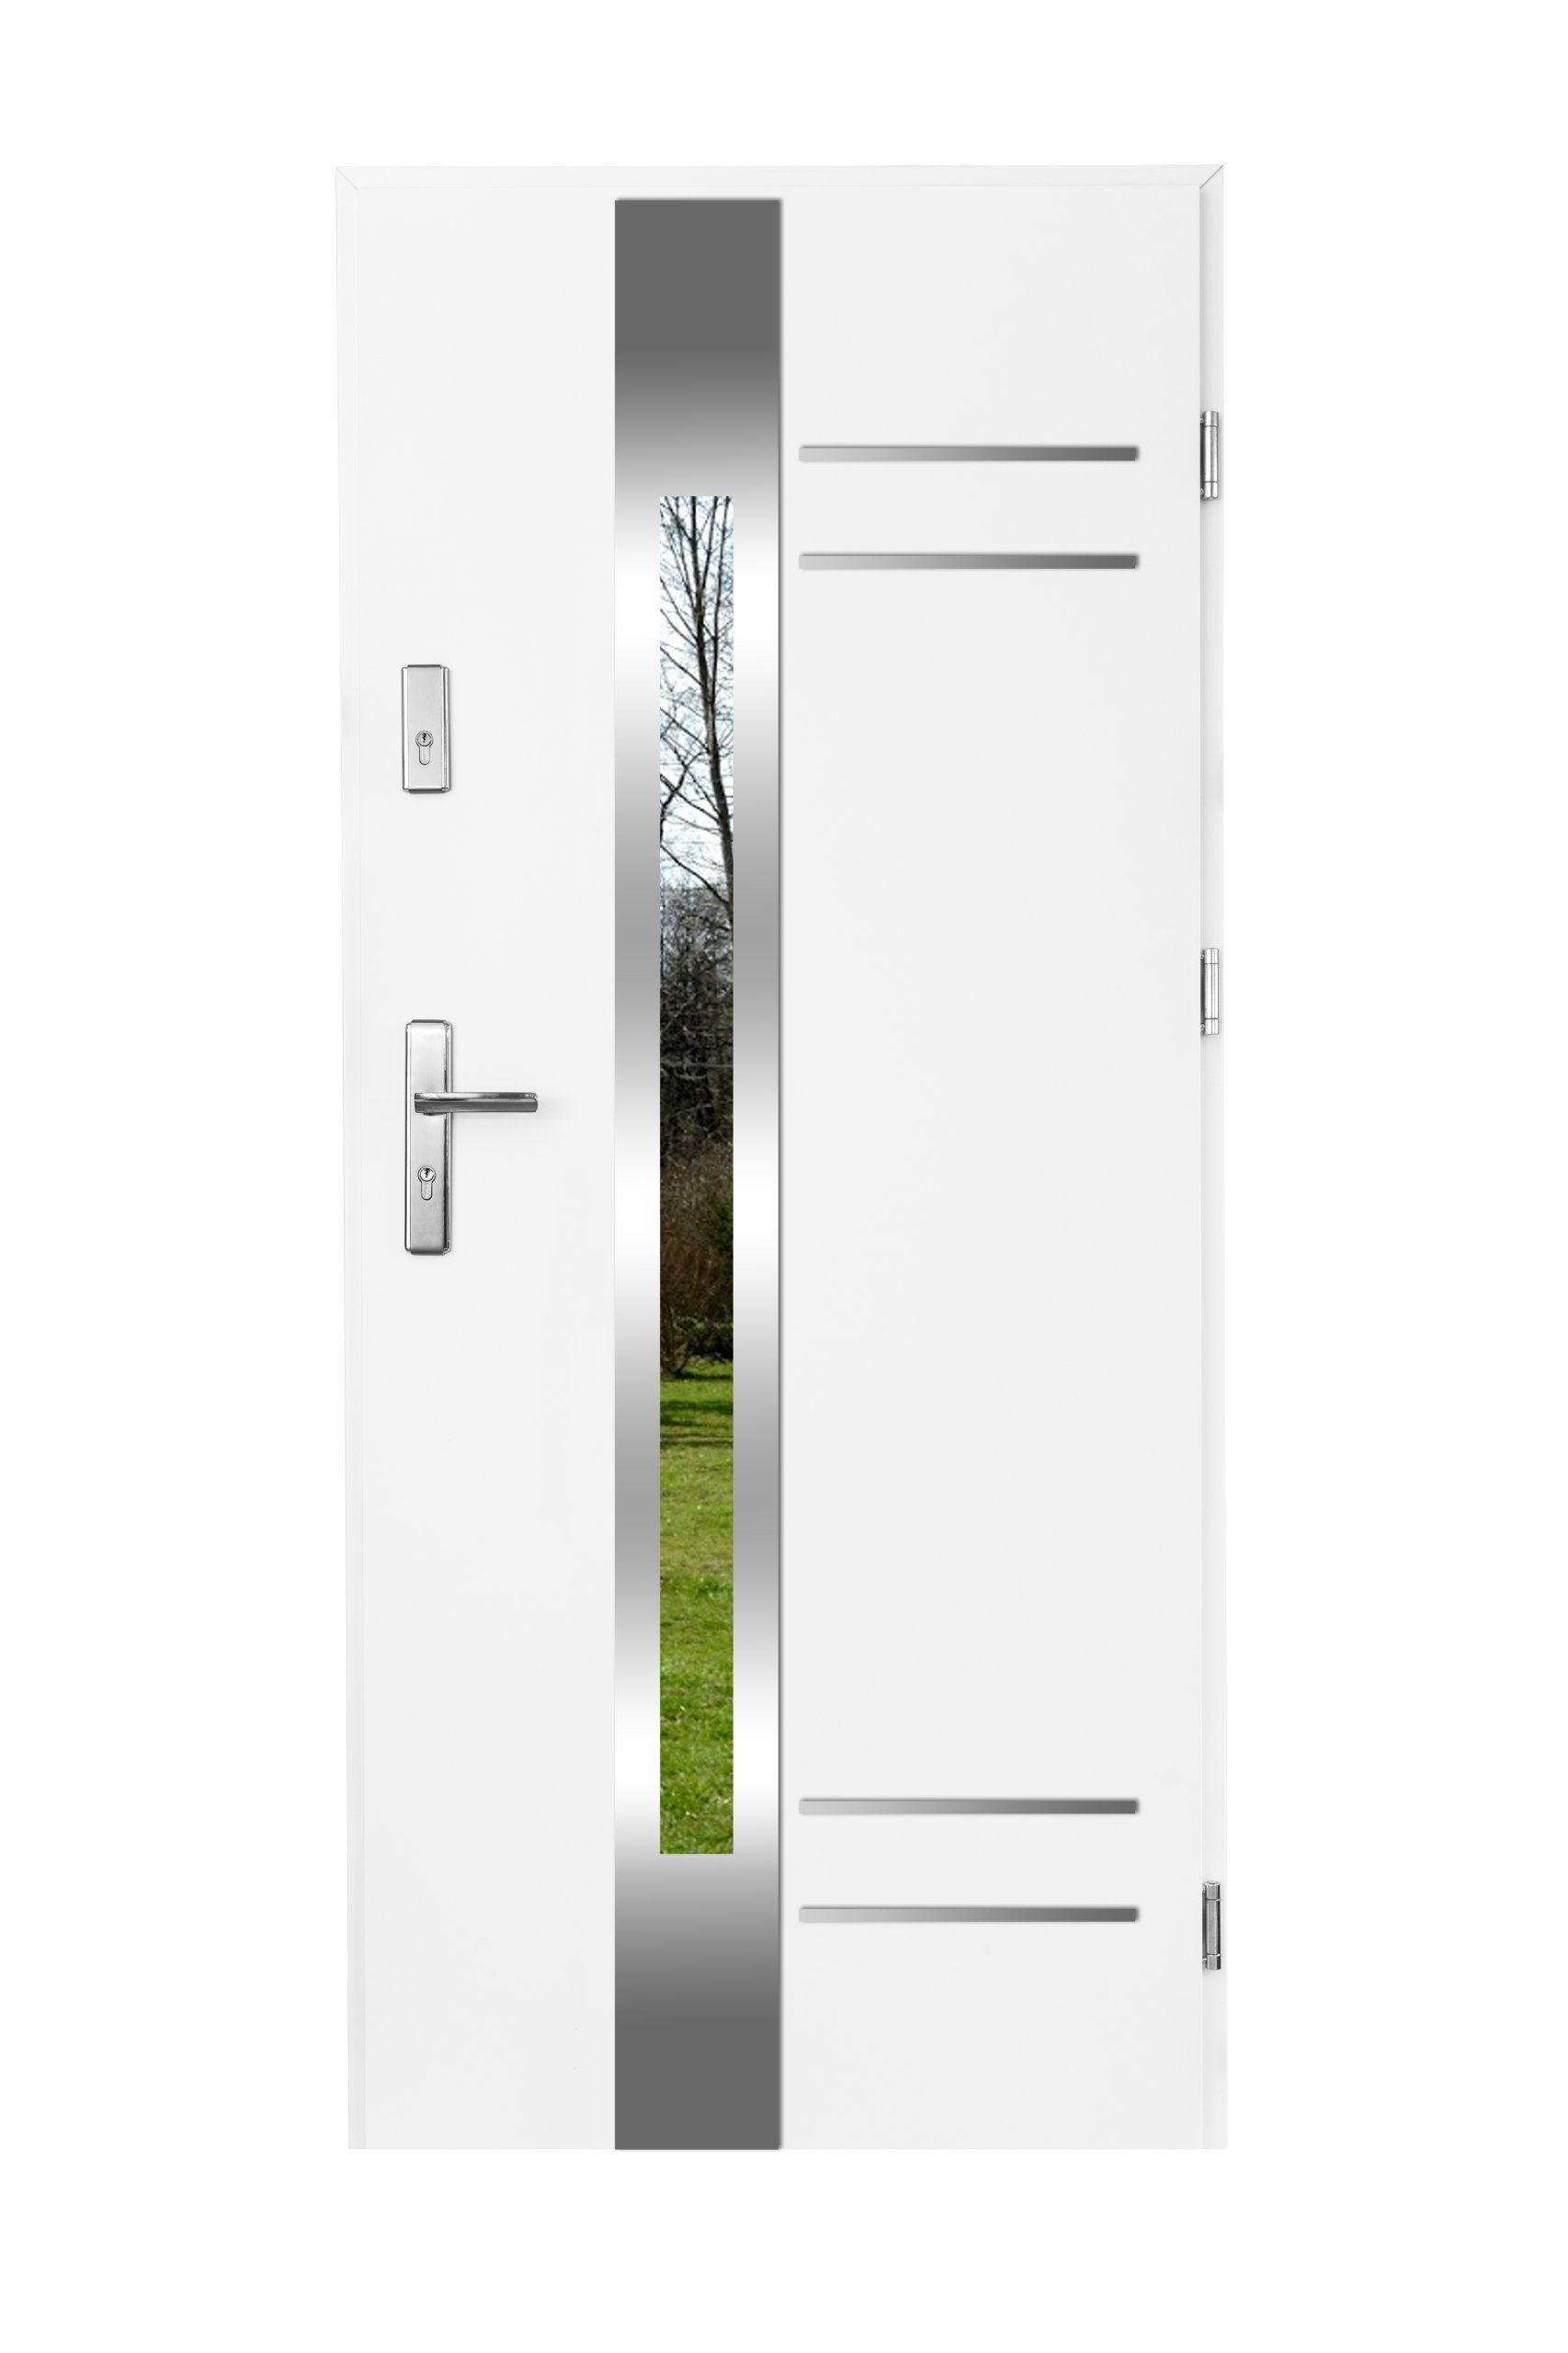 EXTERNAL STEEL ENTRANCE DOORS 55mm FROM HAND – 6862709401 …